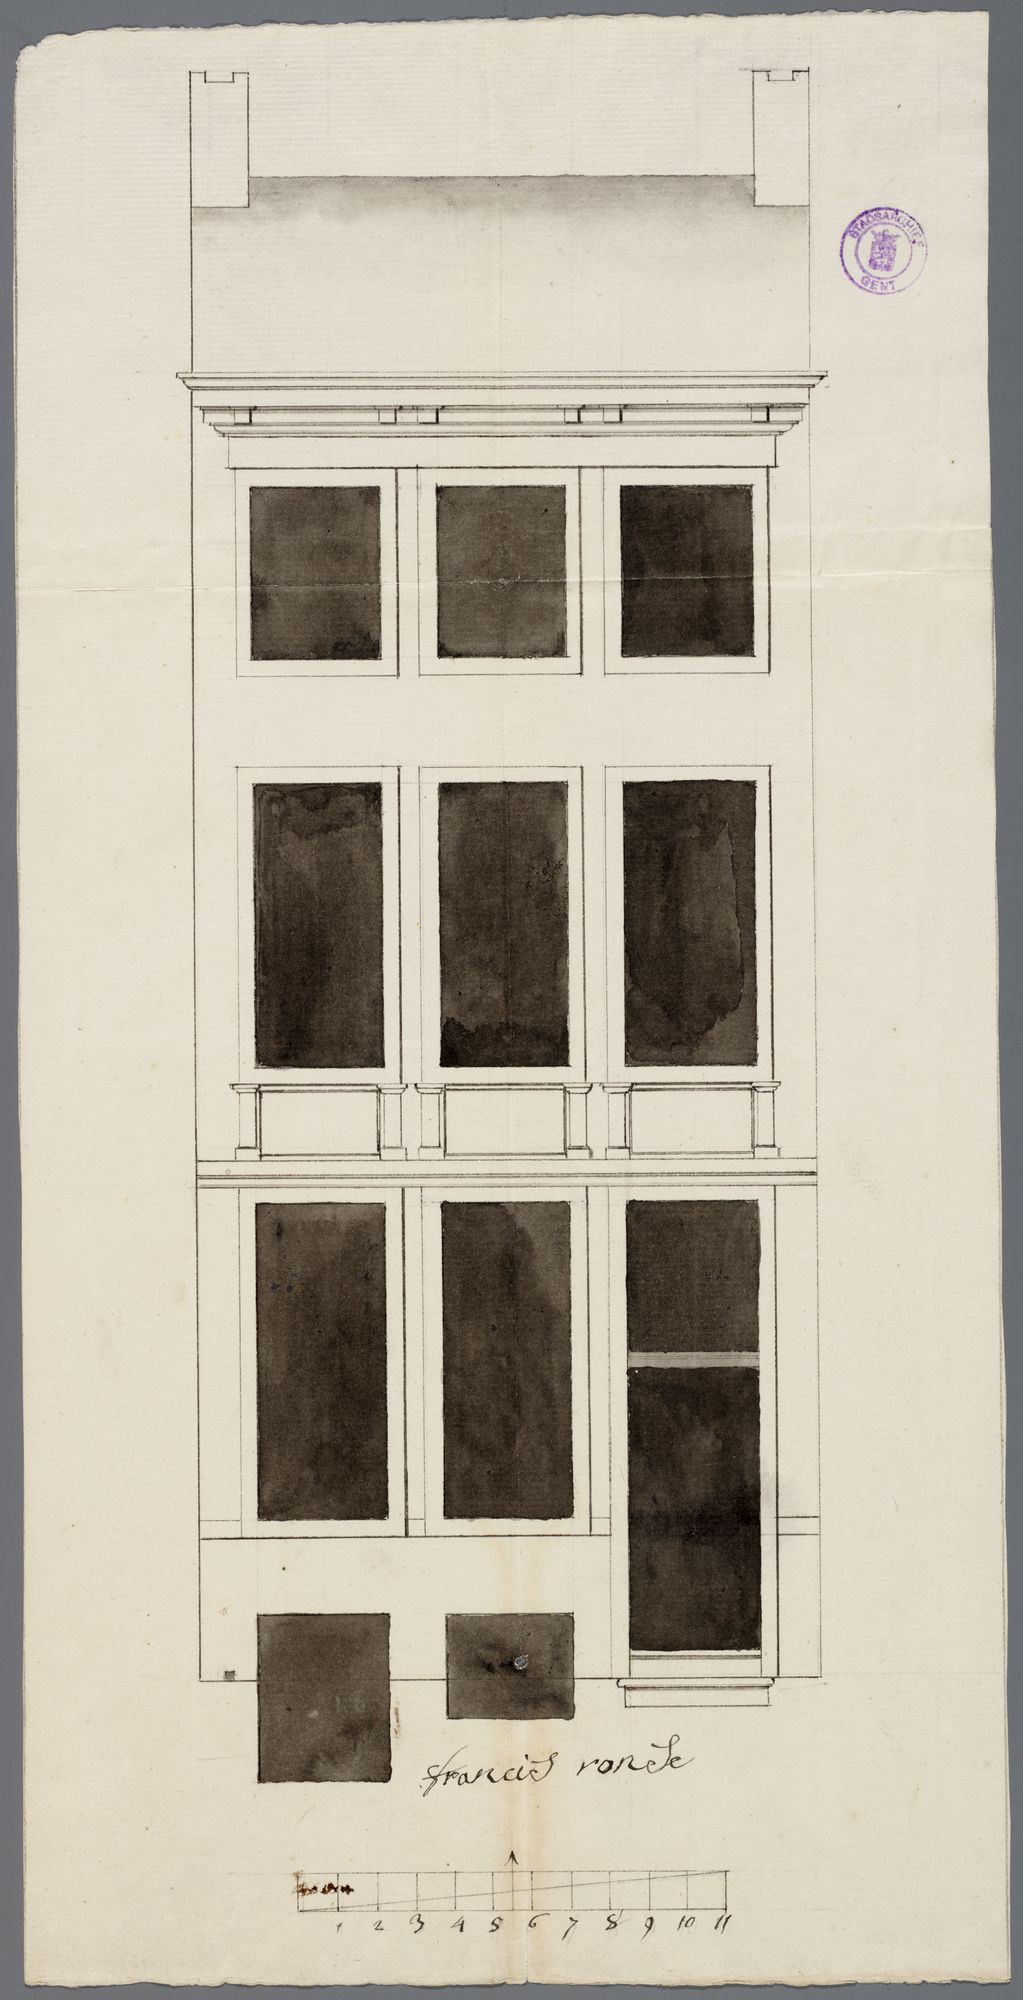 Gent: Zandberg, 1793: opstand gevel